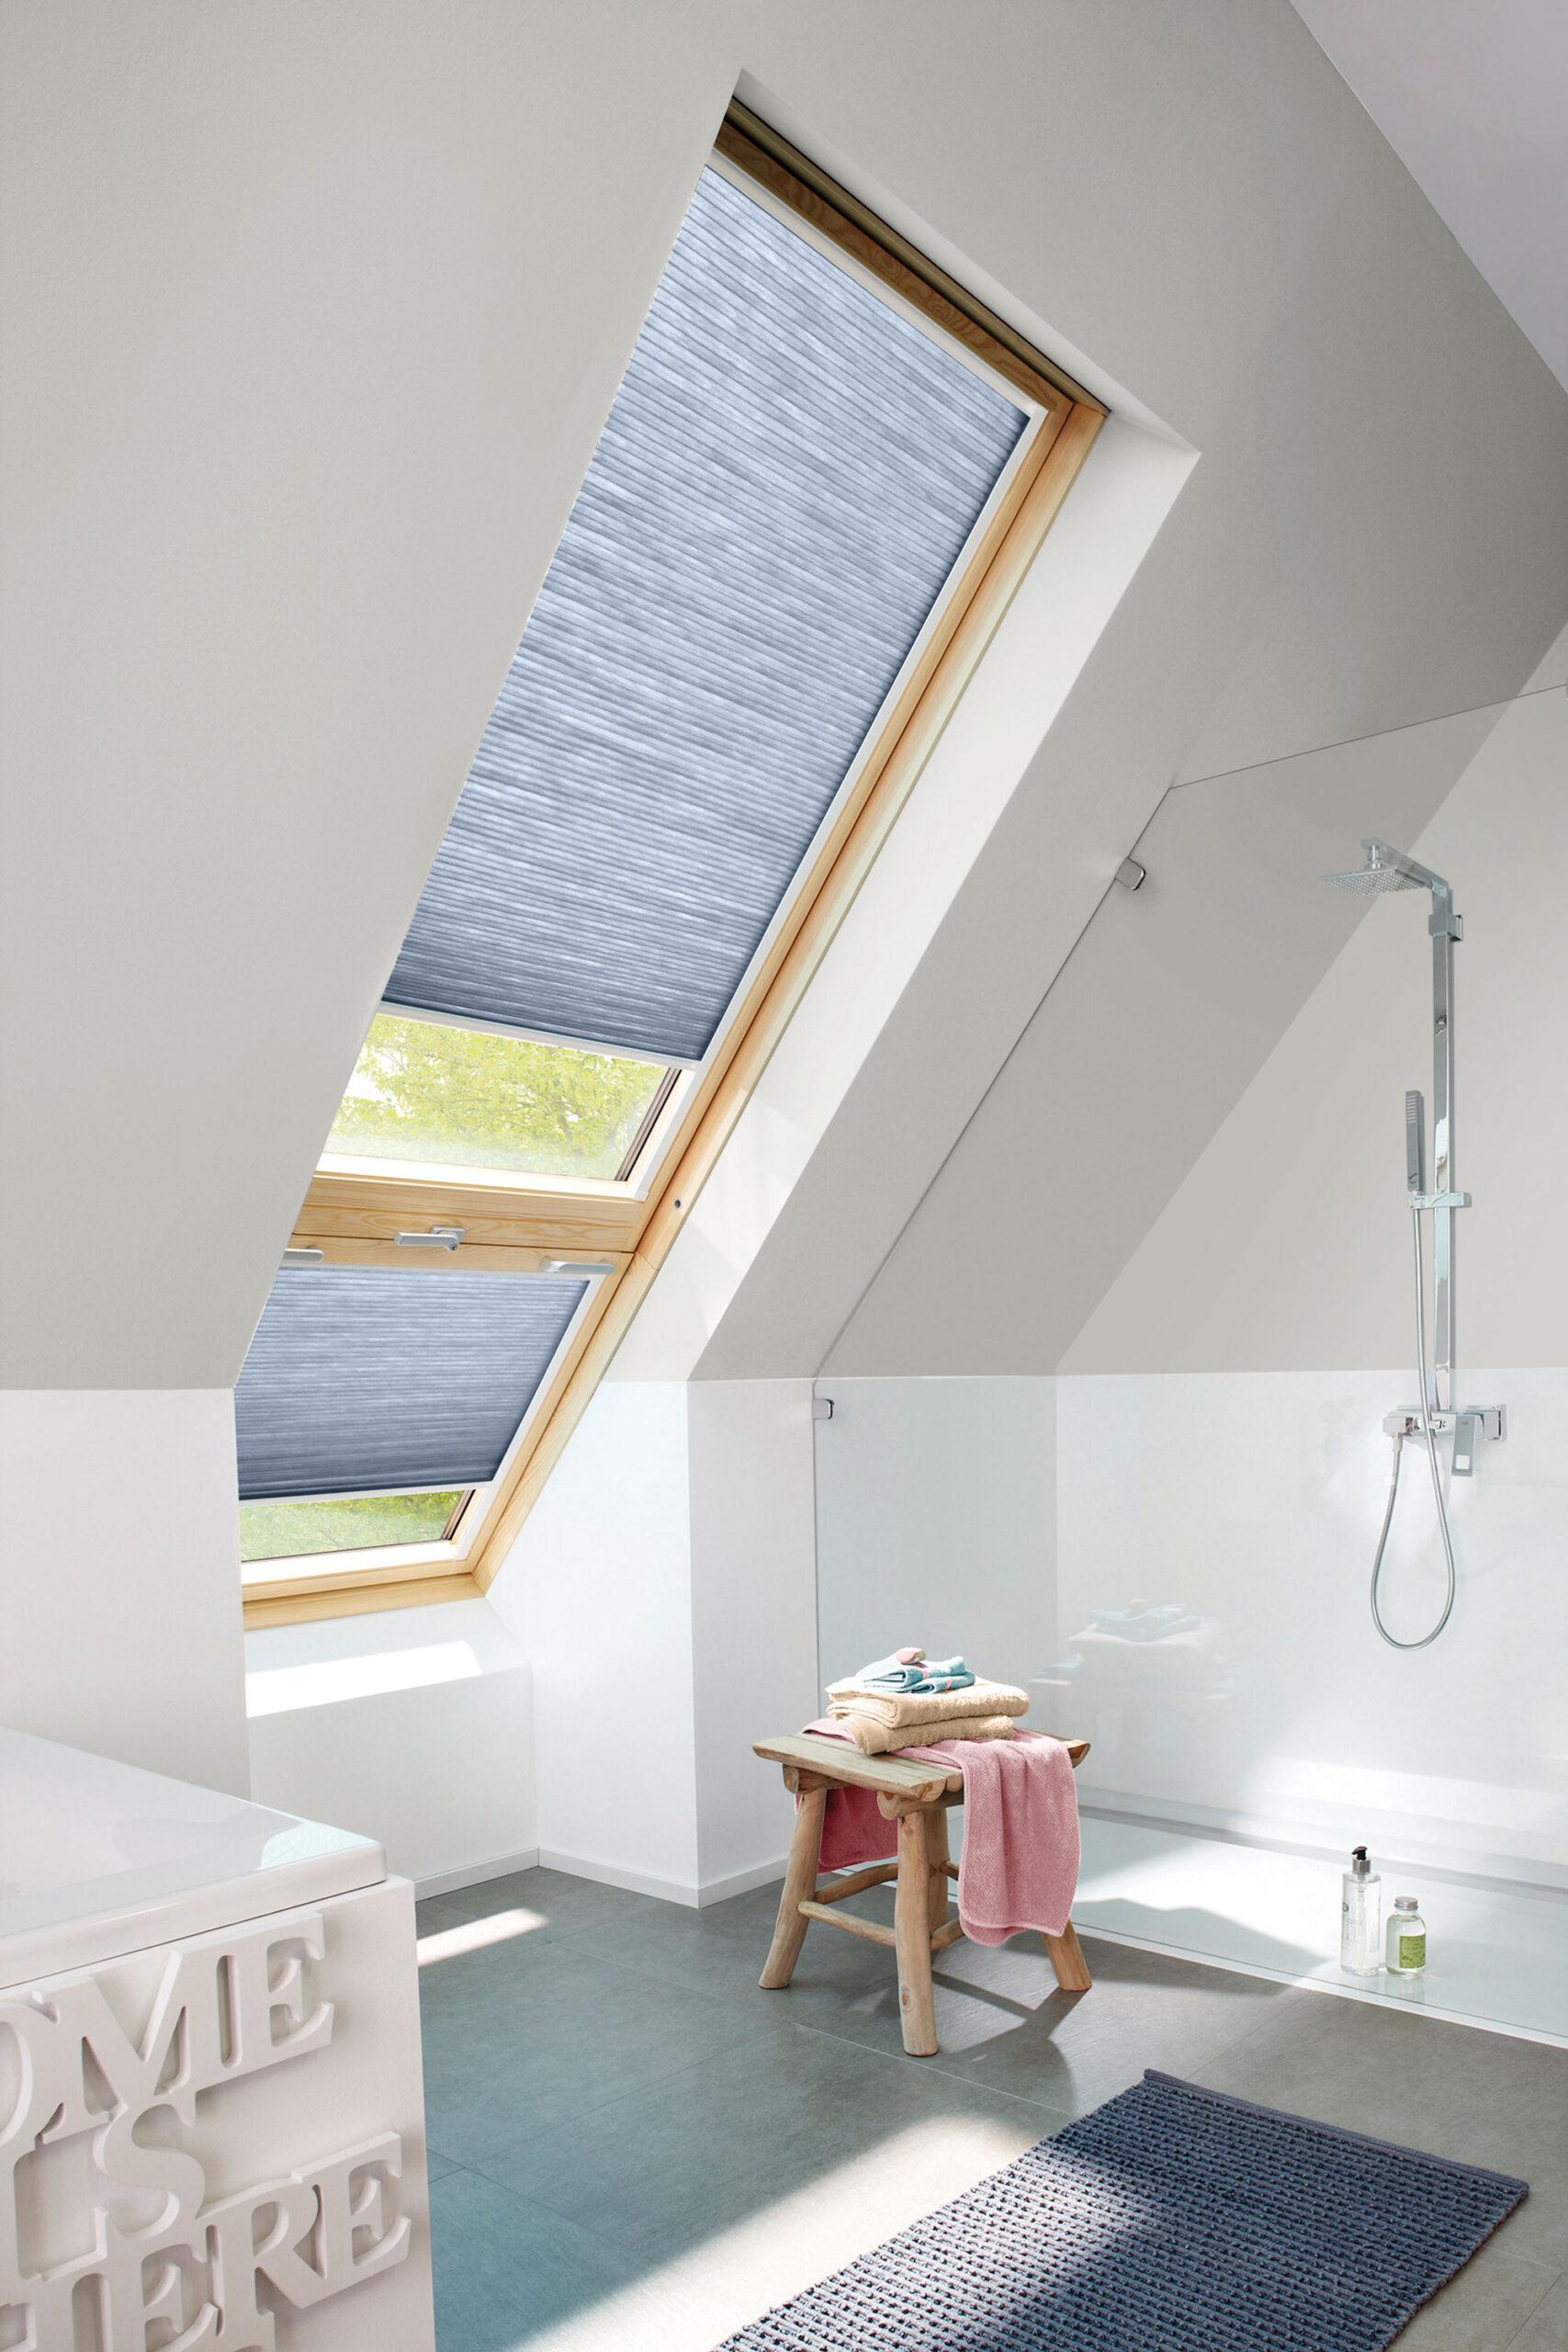 sky light Atrium window coverings